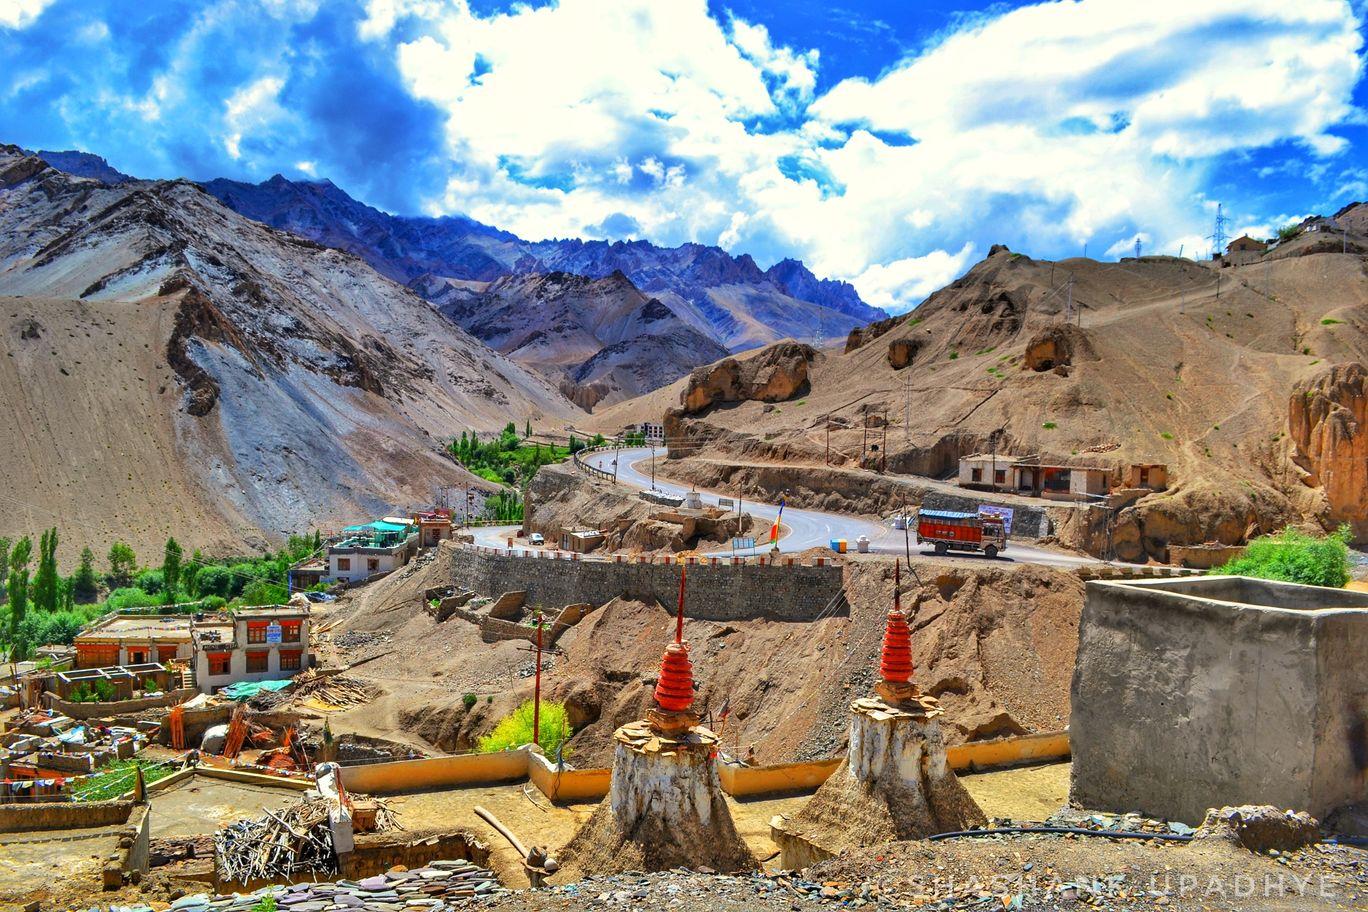 Photo of Leh By Shashank Upadhye